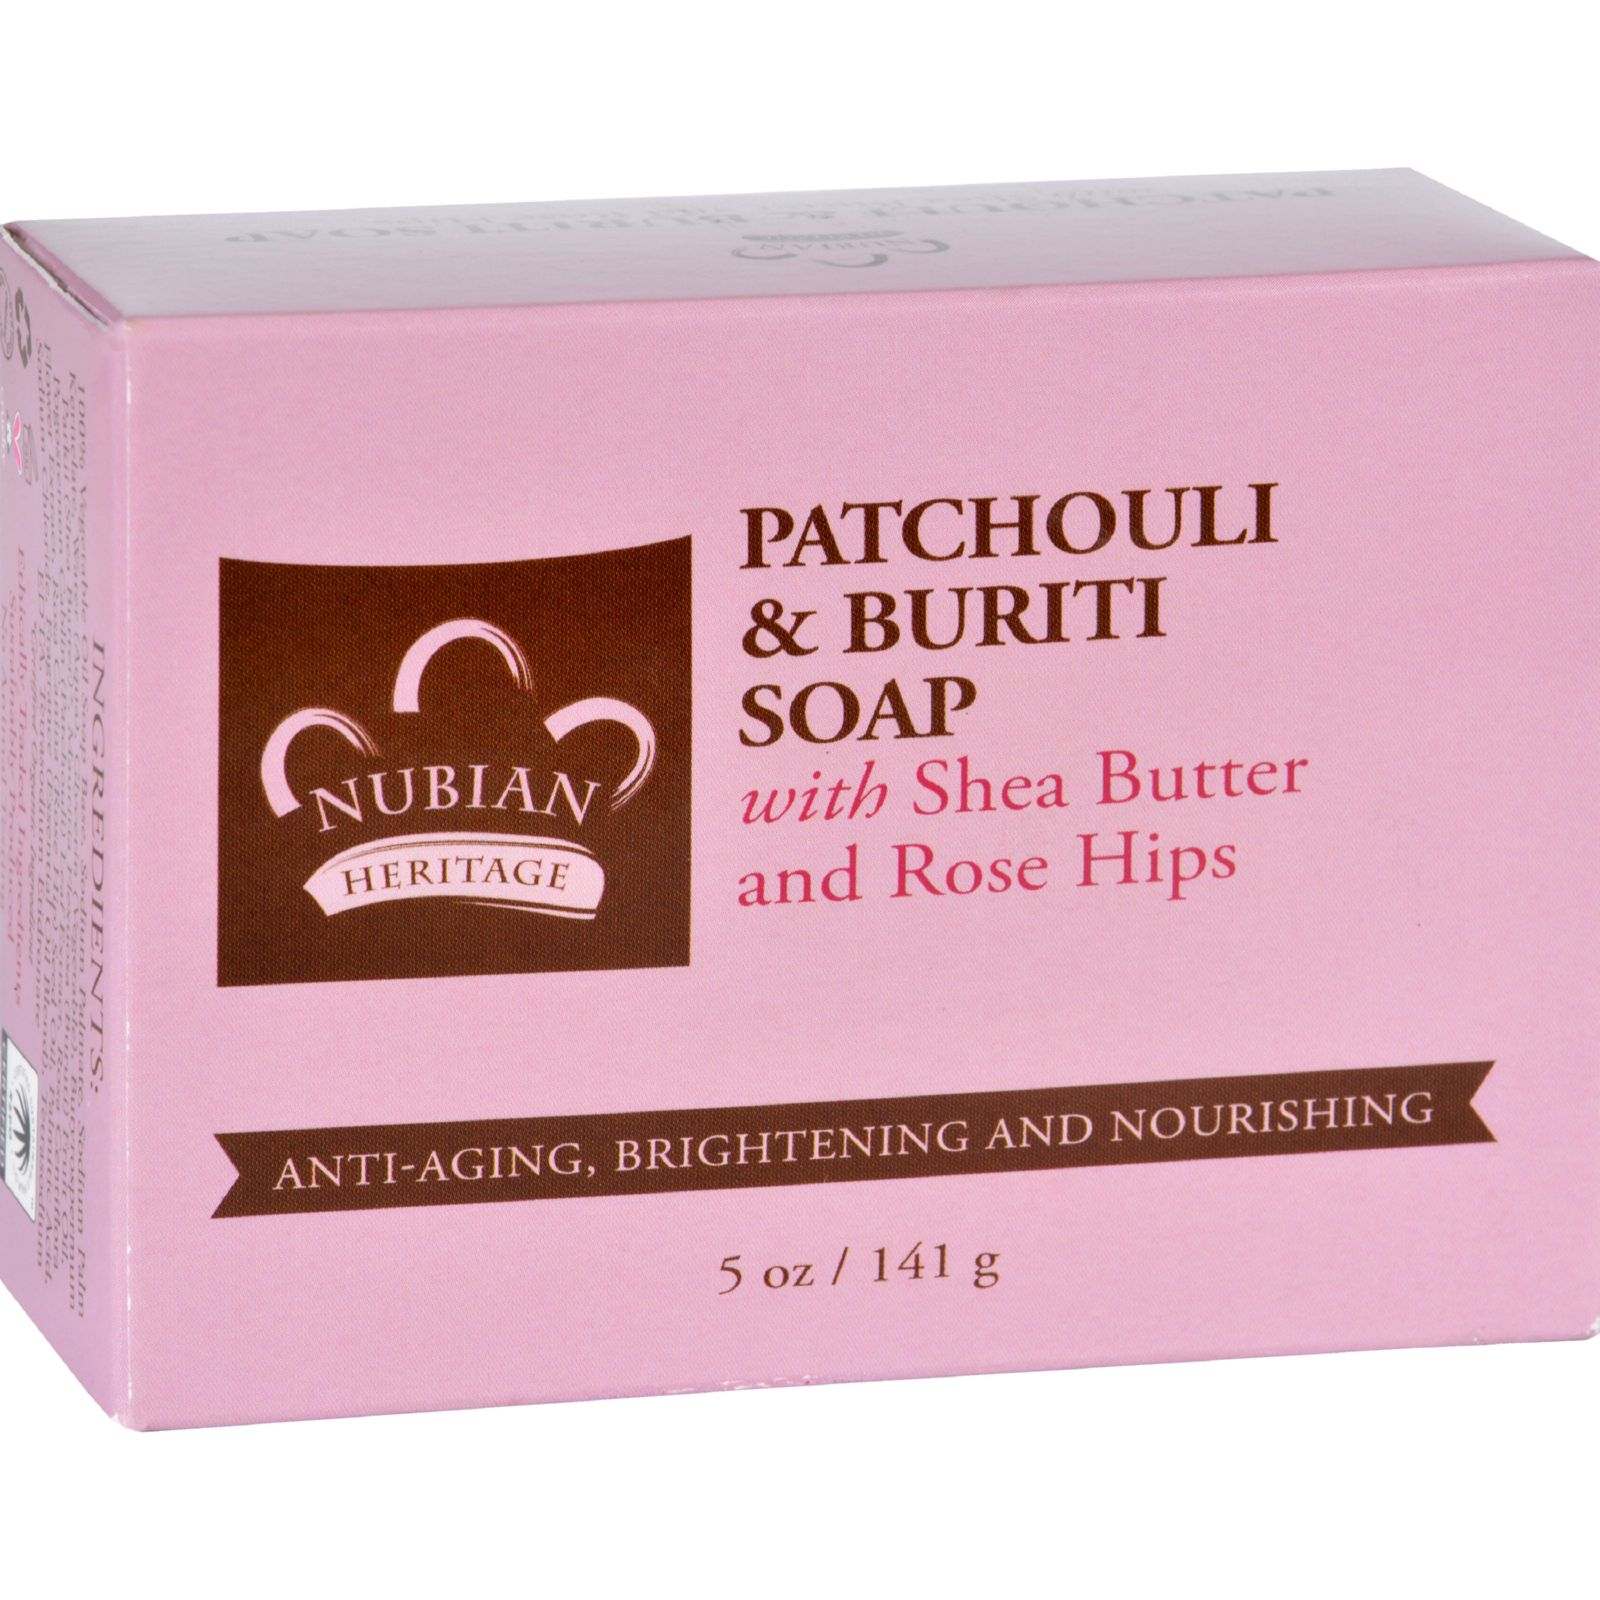 Nubian Heritage Bar Soap  Patchouli and Buriti  5 oz